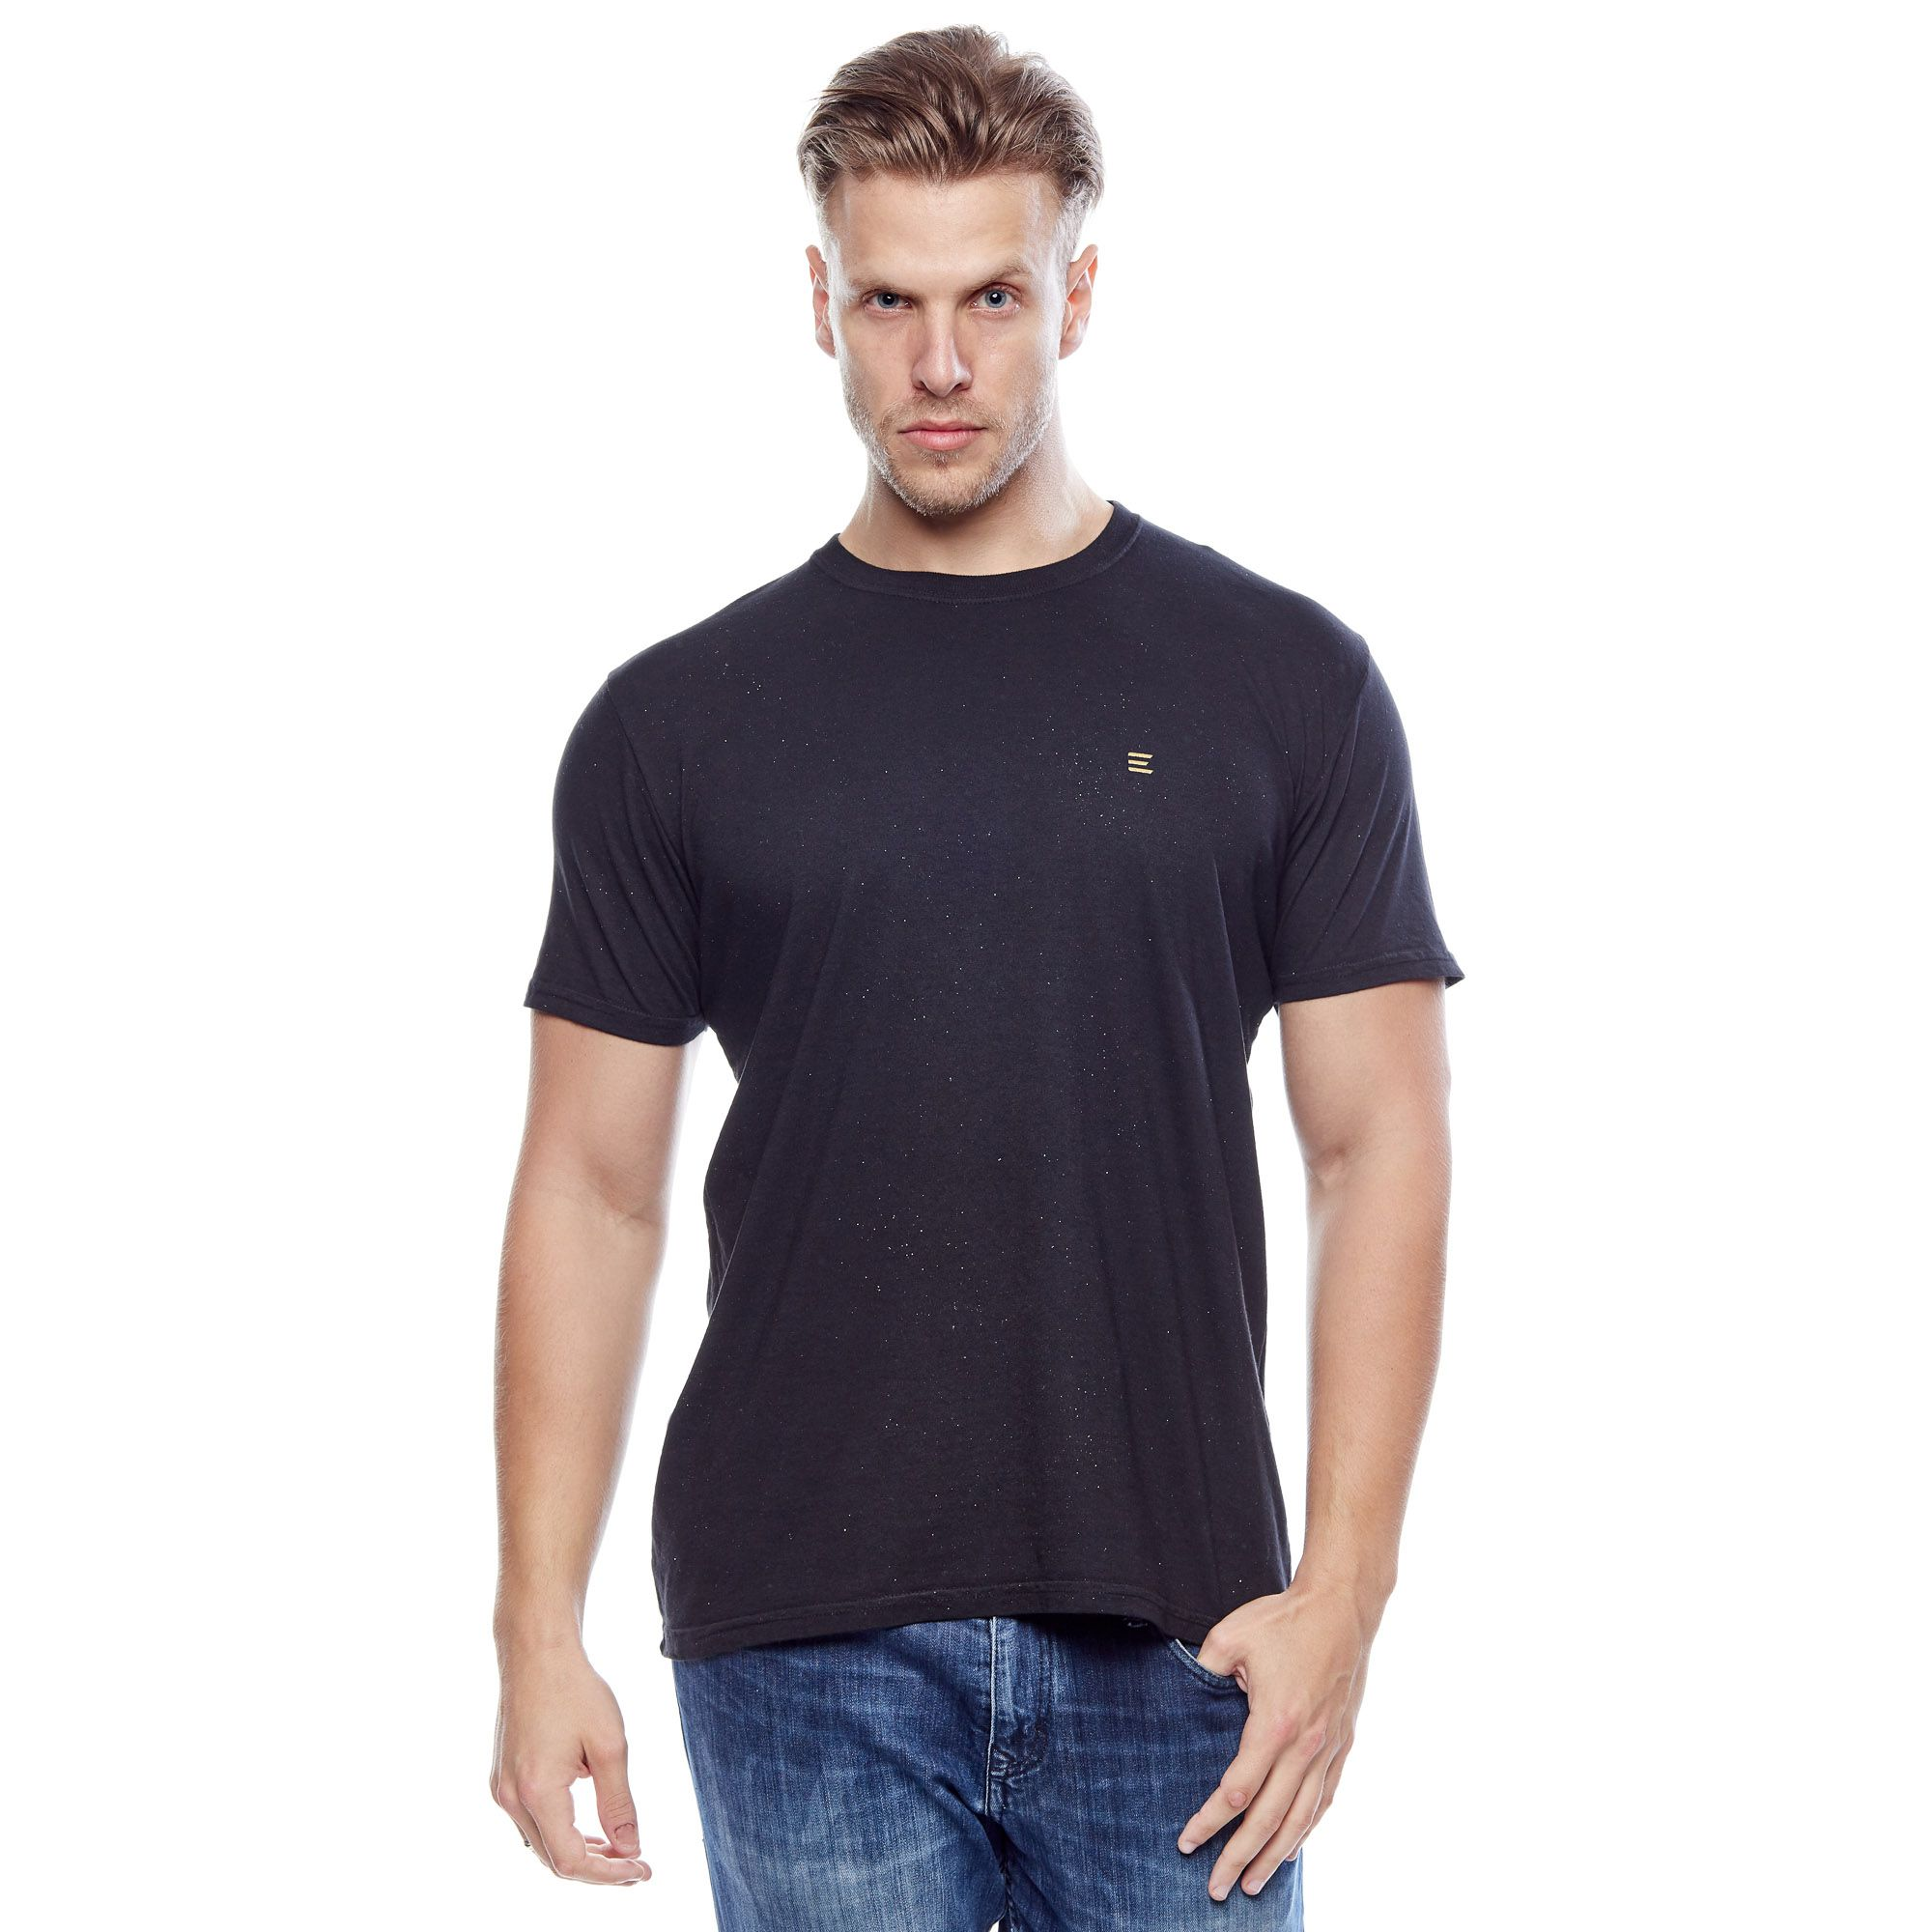 Camiseta Evolvee Shine Masculina